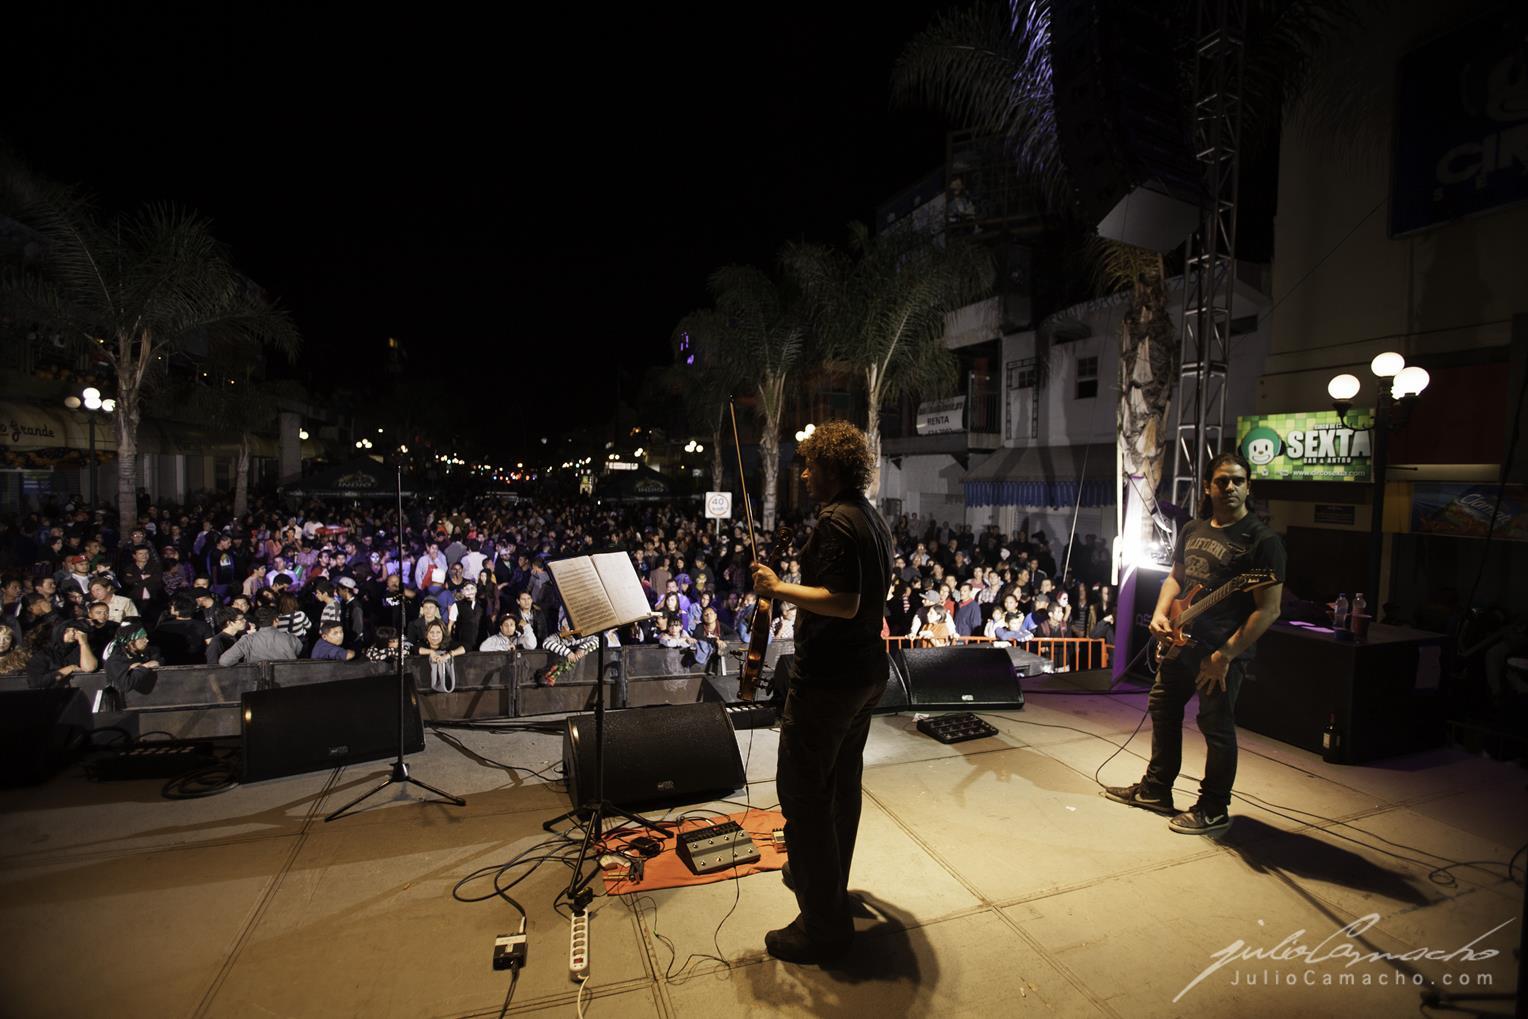 2014-10-30 31 CAST TOUR Ensenada y Tijuana - 1363 - www.Juli (Copy).jpg